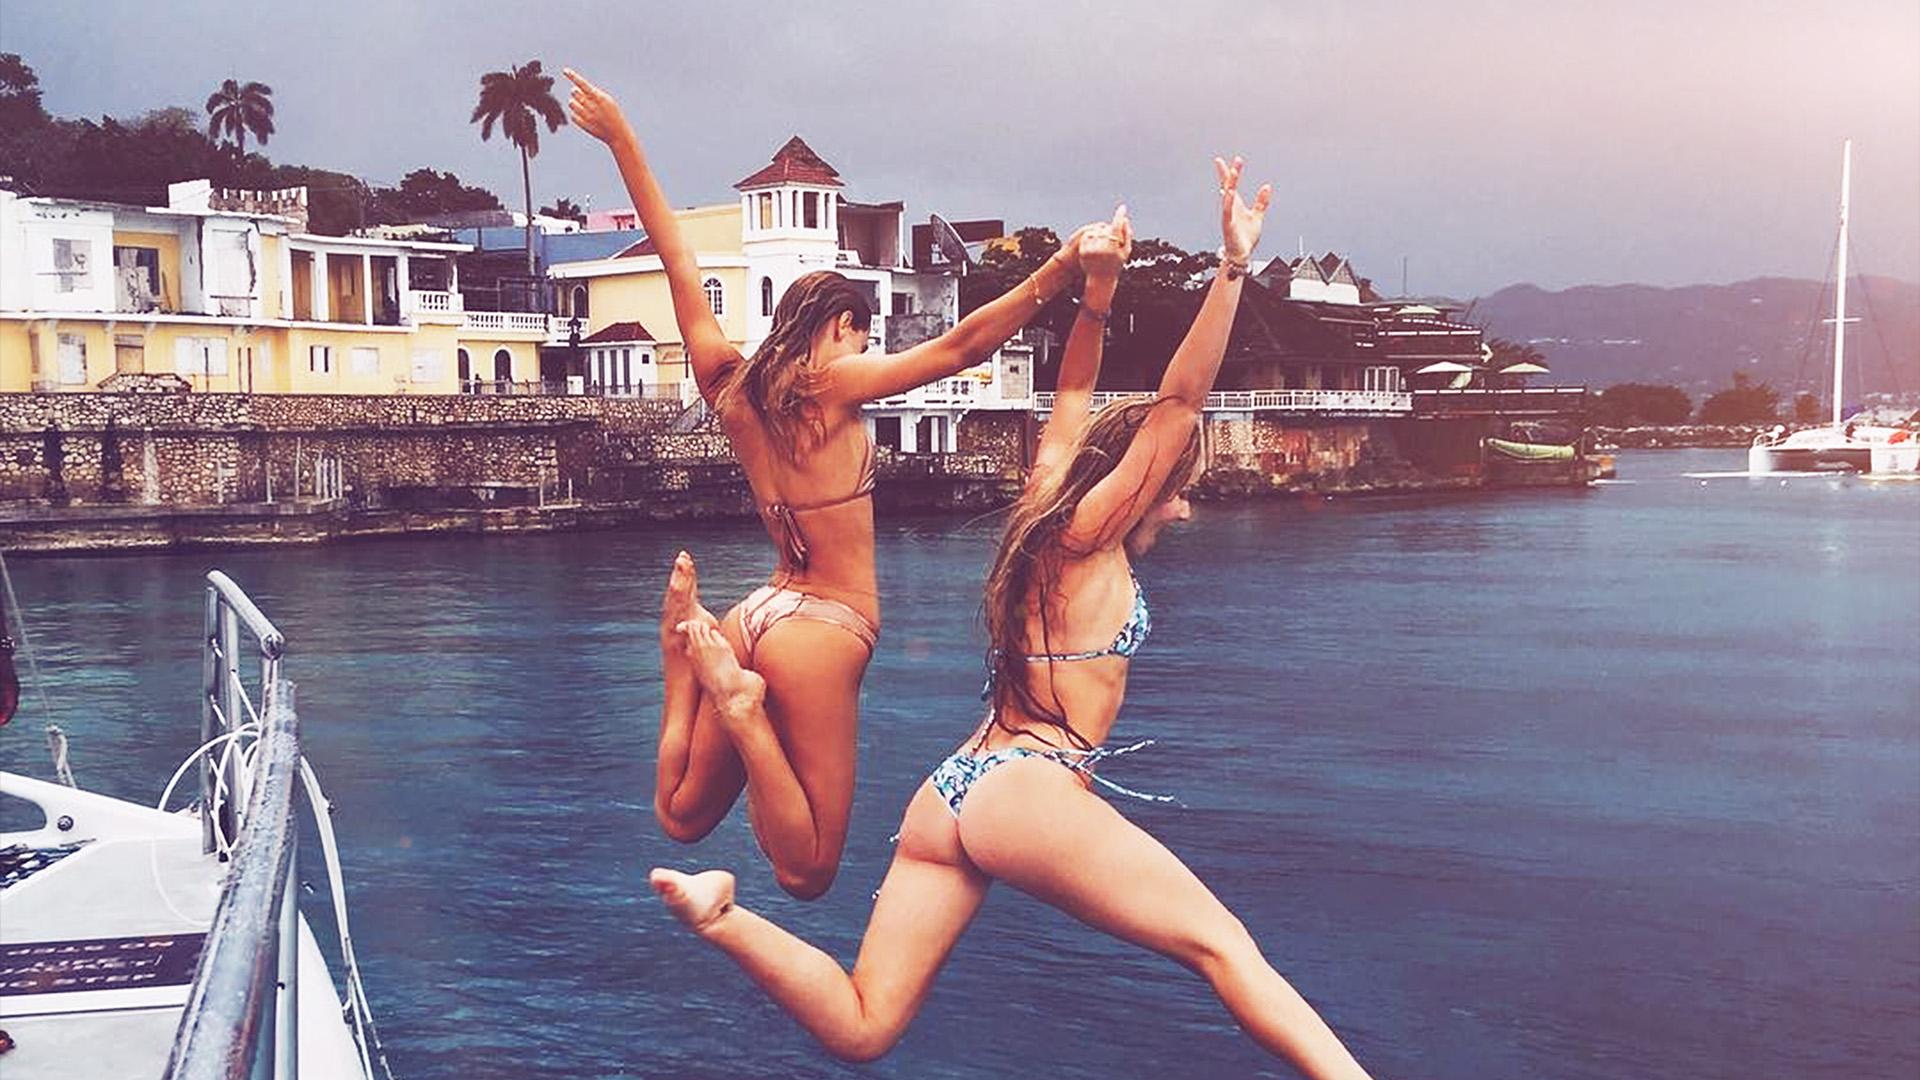 Ho88 Girl Bikini Sexy Dive Summer Water Wallpaper